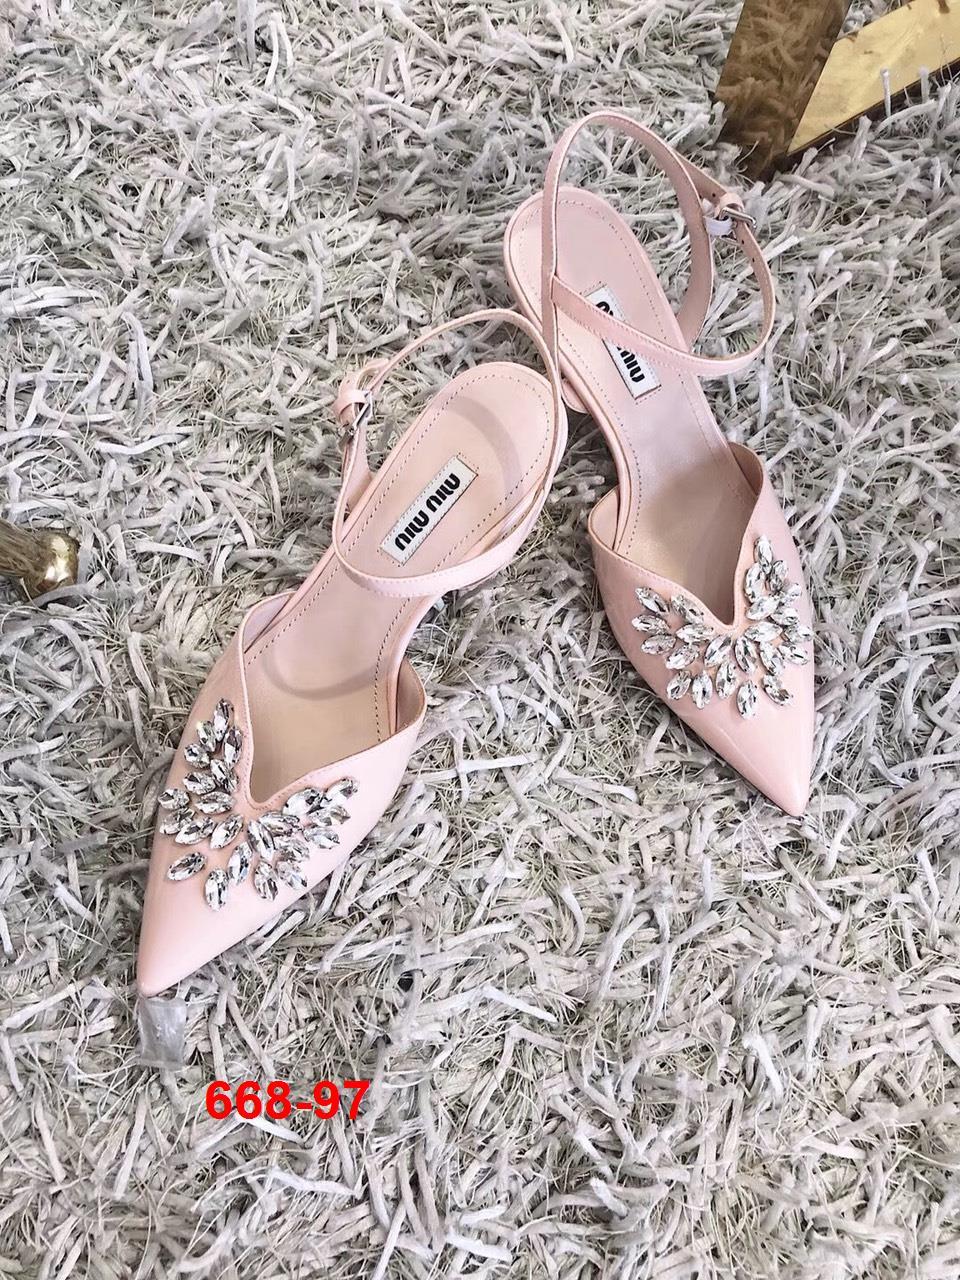 668-97 Miu Miu sandal cao 6cm siêu cấp